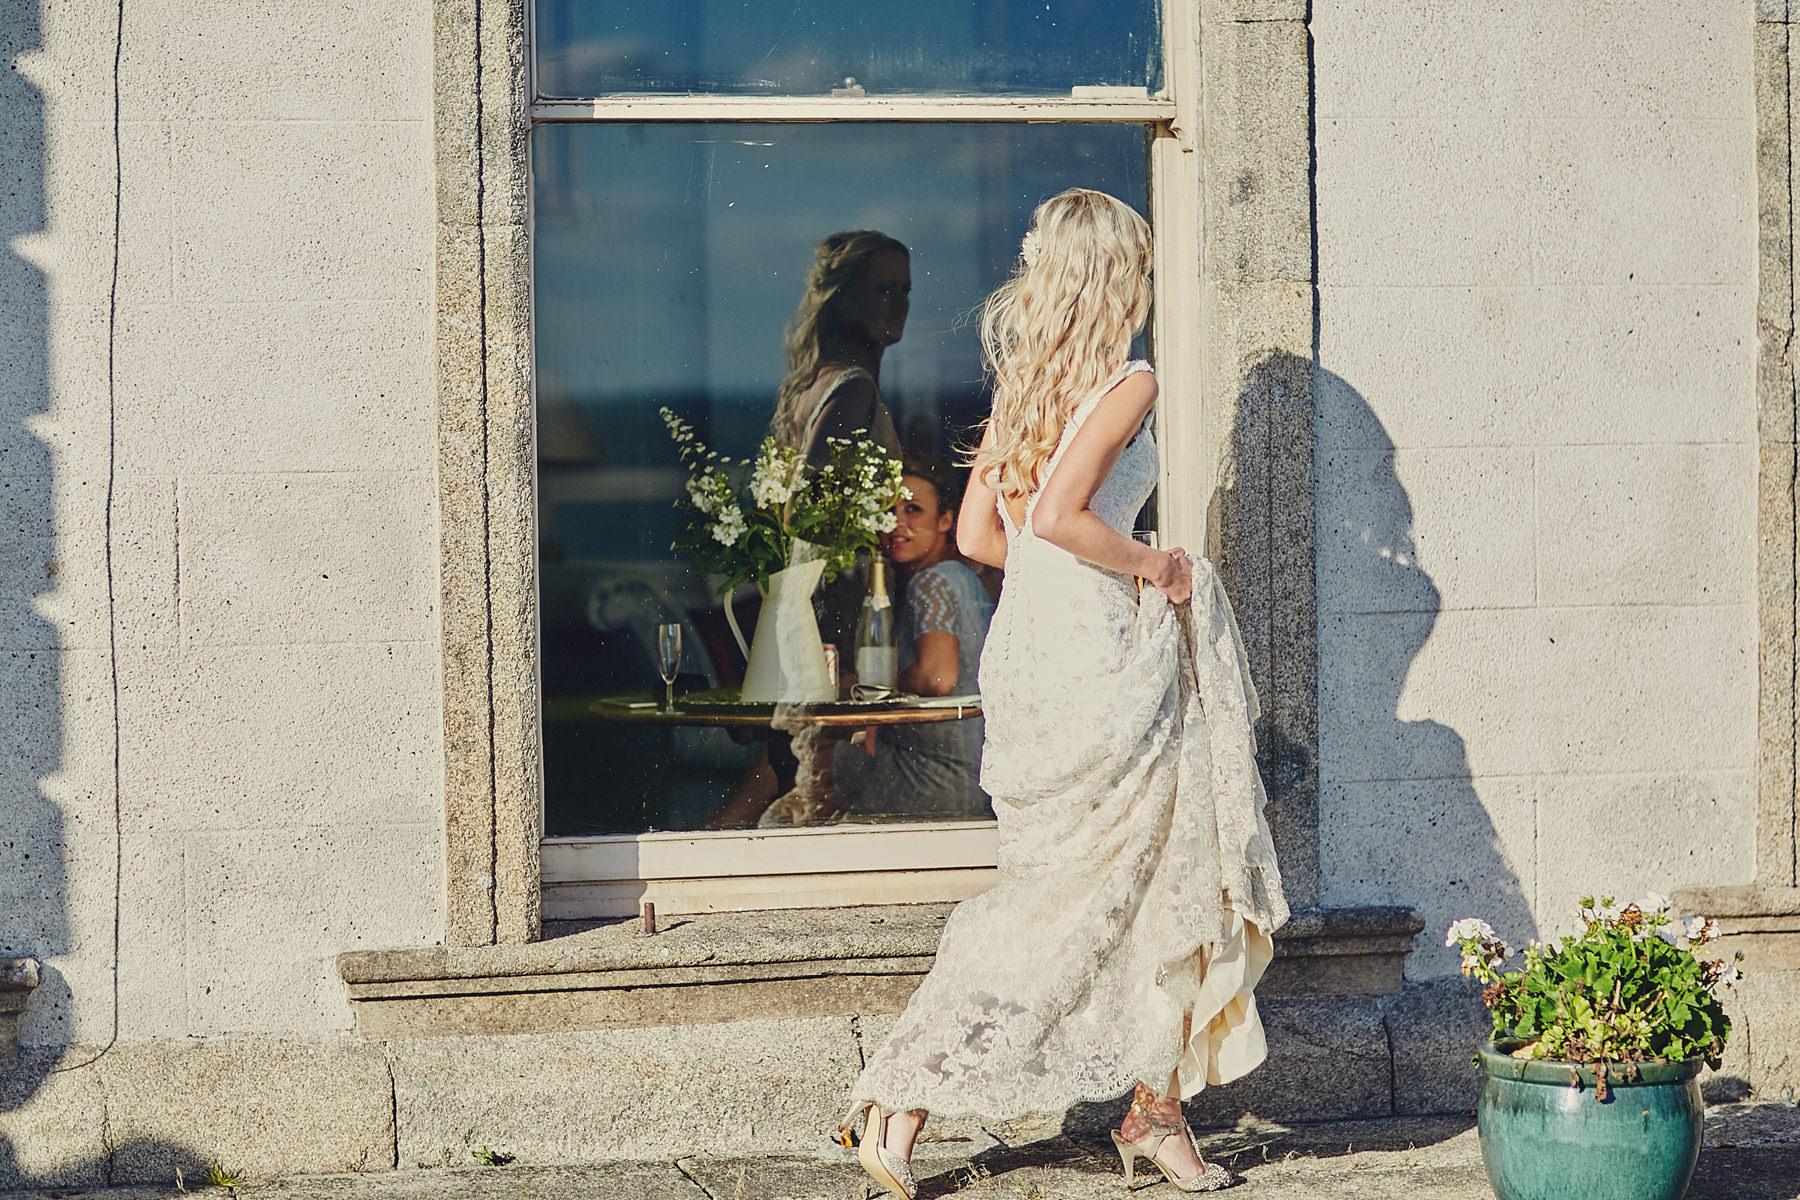 Wedding at Borris House co.Carlow 058 - Borris House wedding | Cara & David